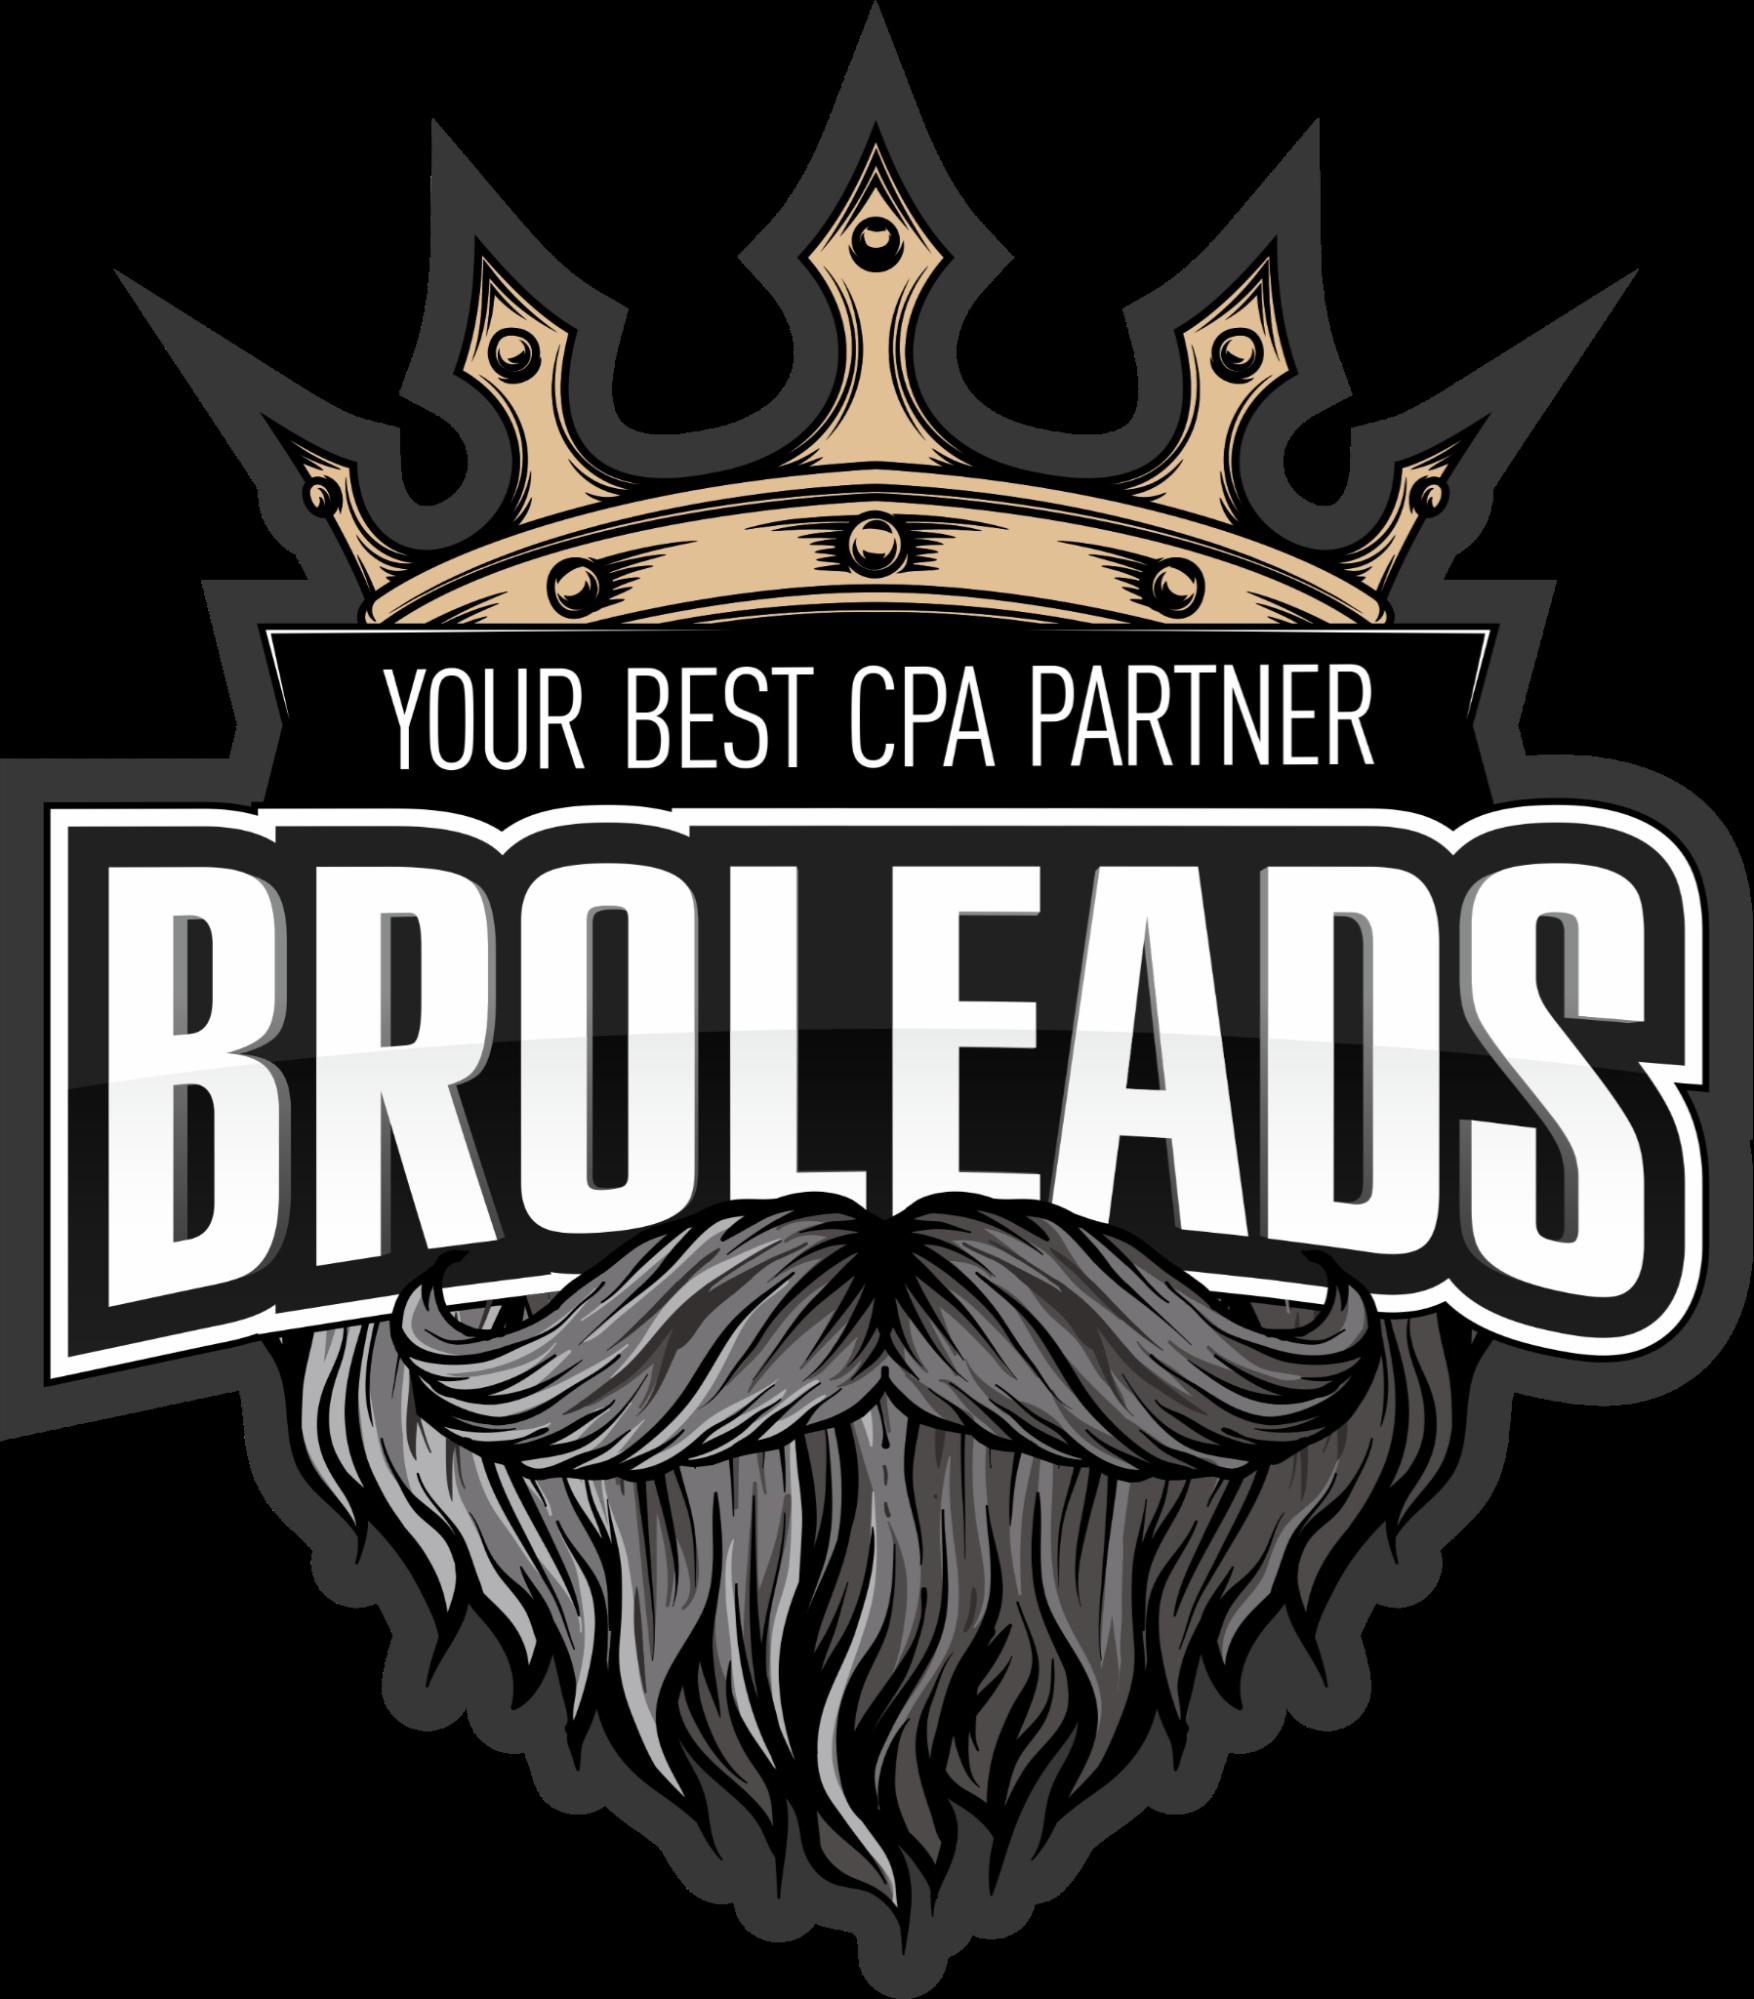 Broleads